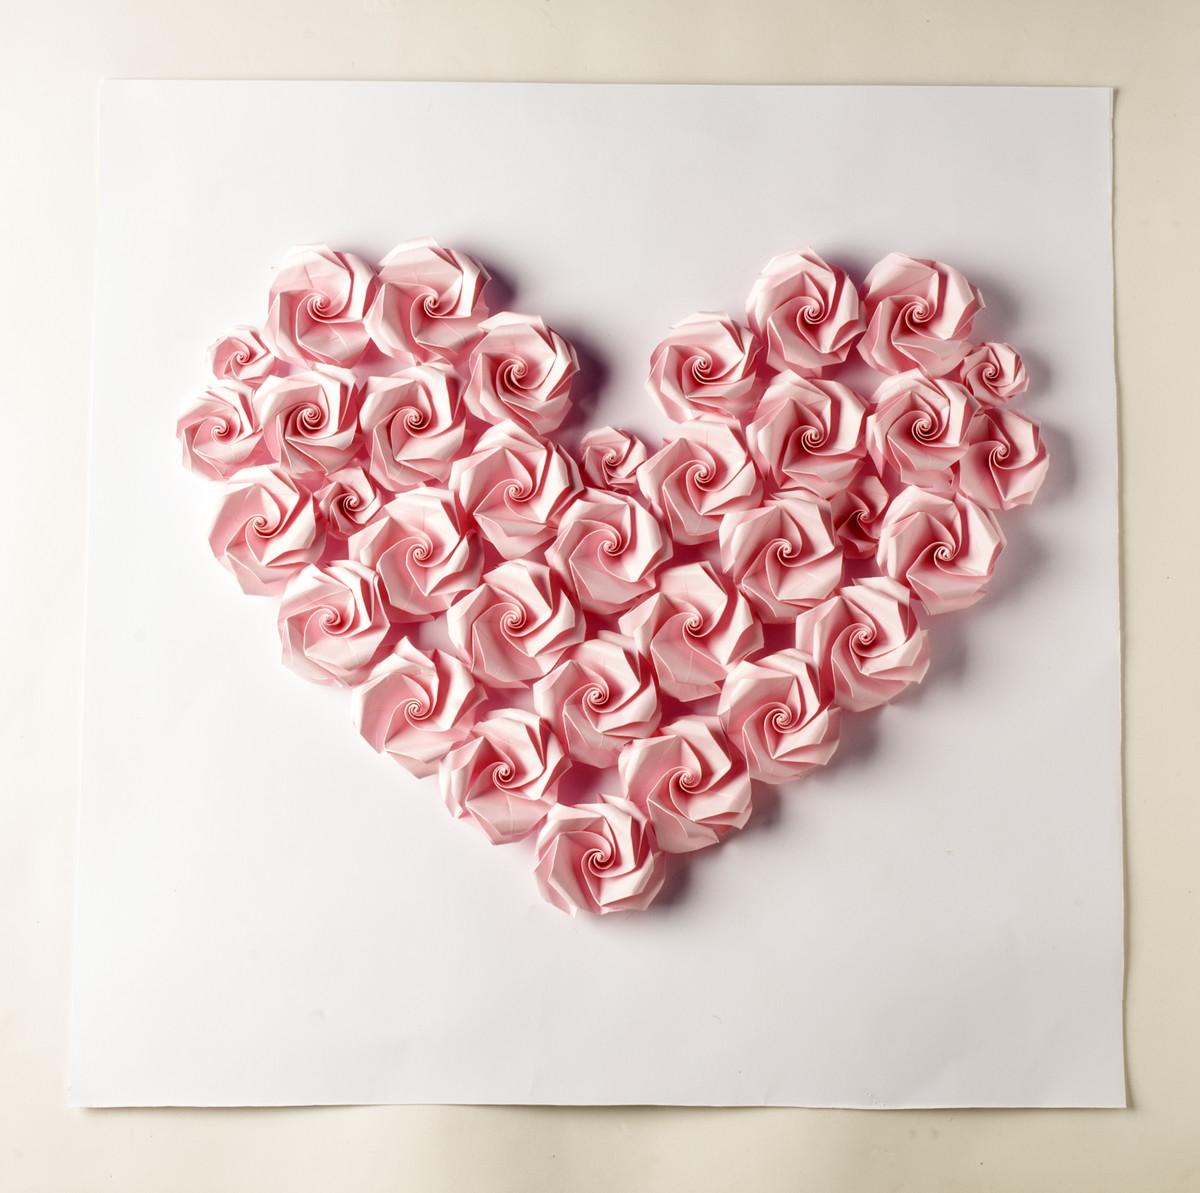 Rosas de amor - Painel de 50 x 50m no Elo7 | Cecile de Luz - Arte ...